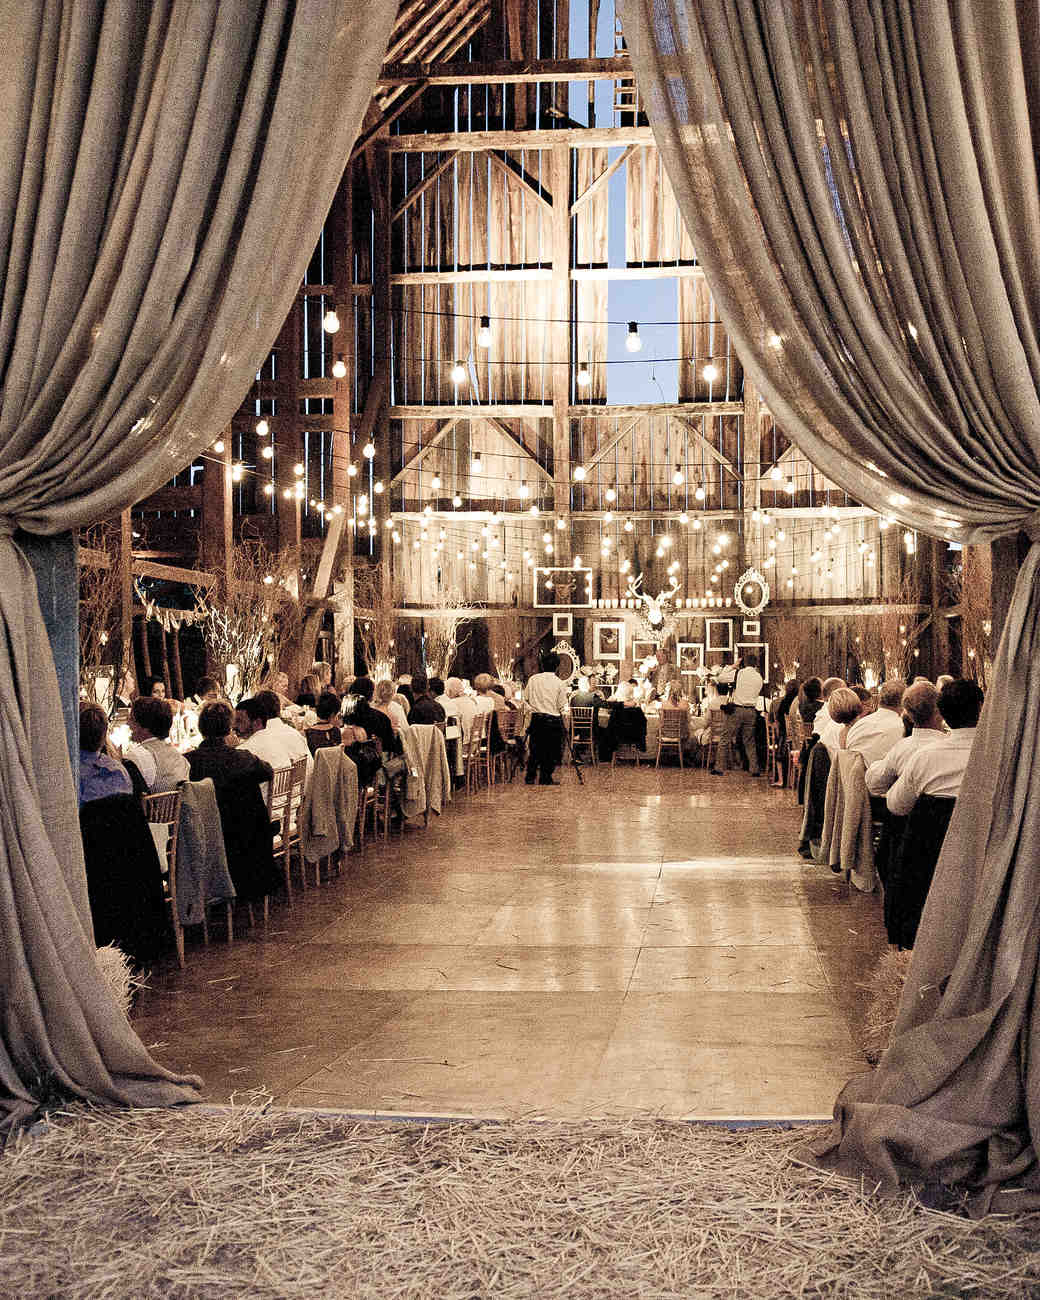 A Vintage Rustic Wedding In A Barn In California